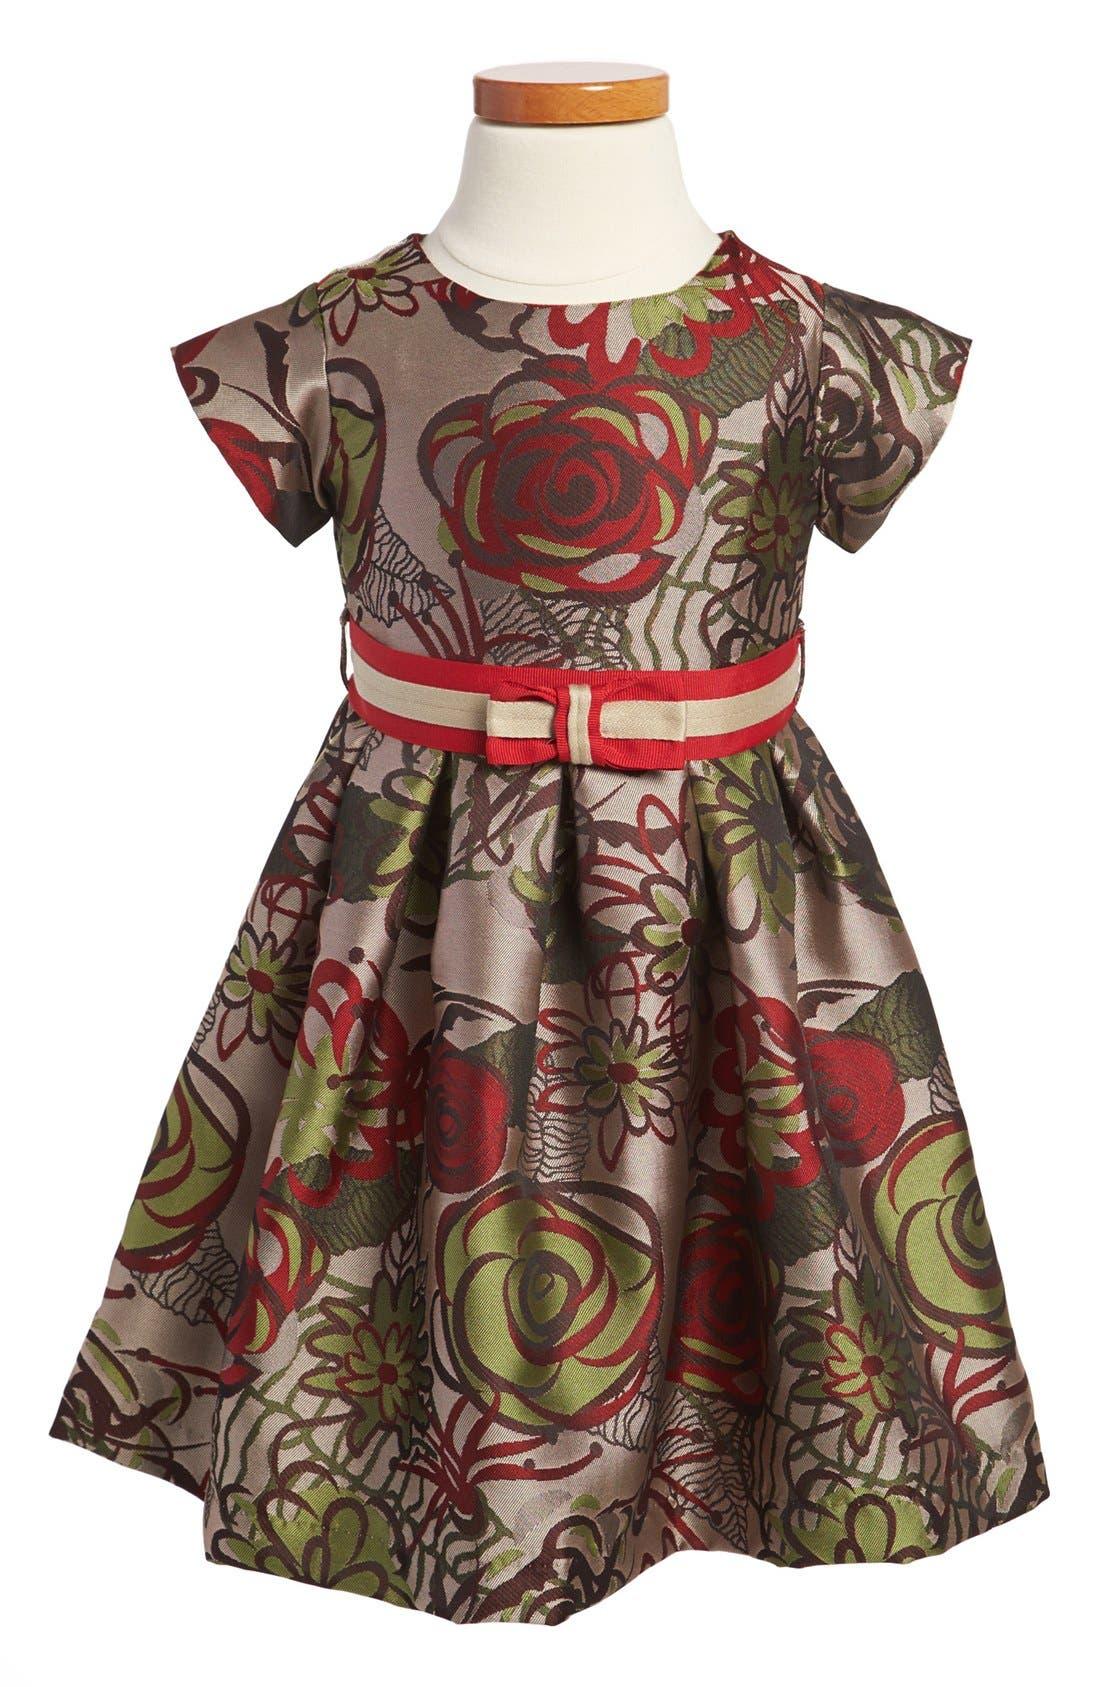 Alternate Image 1 Selected - Us Angels Jacquard Dress (Toddler Girls)